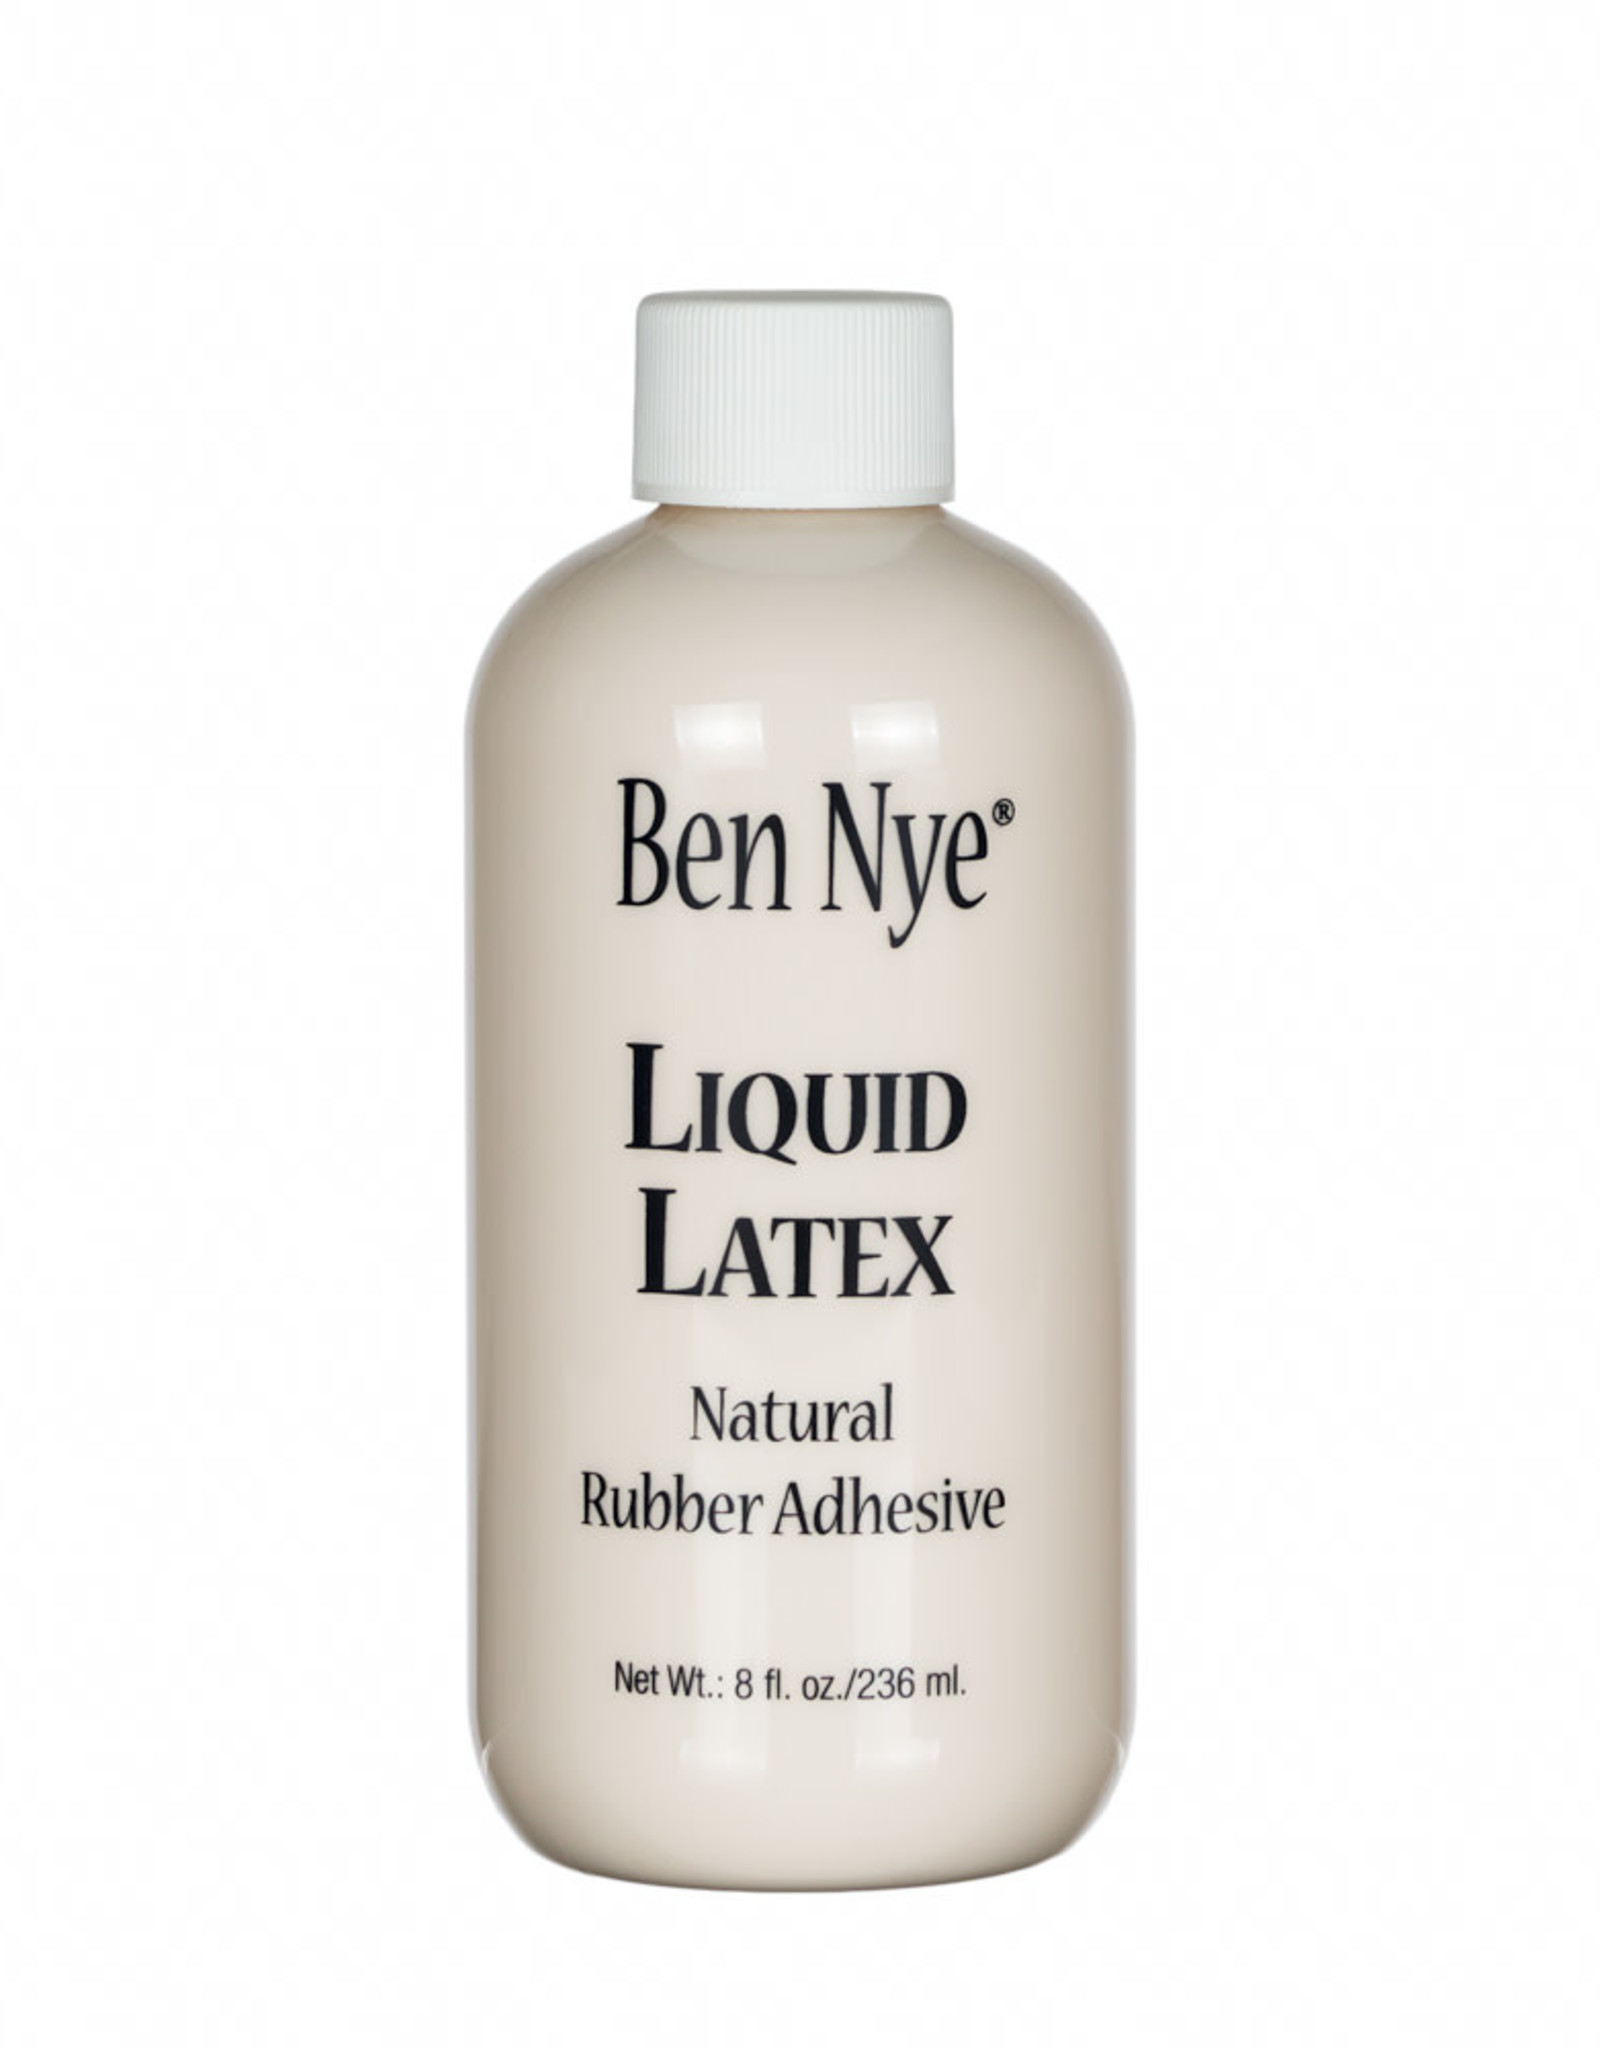 Ben Nye FX LIQUID LATEX, 8 FL OZ